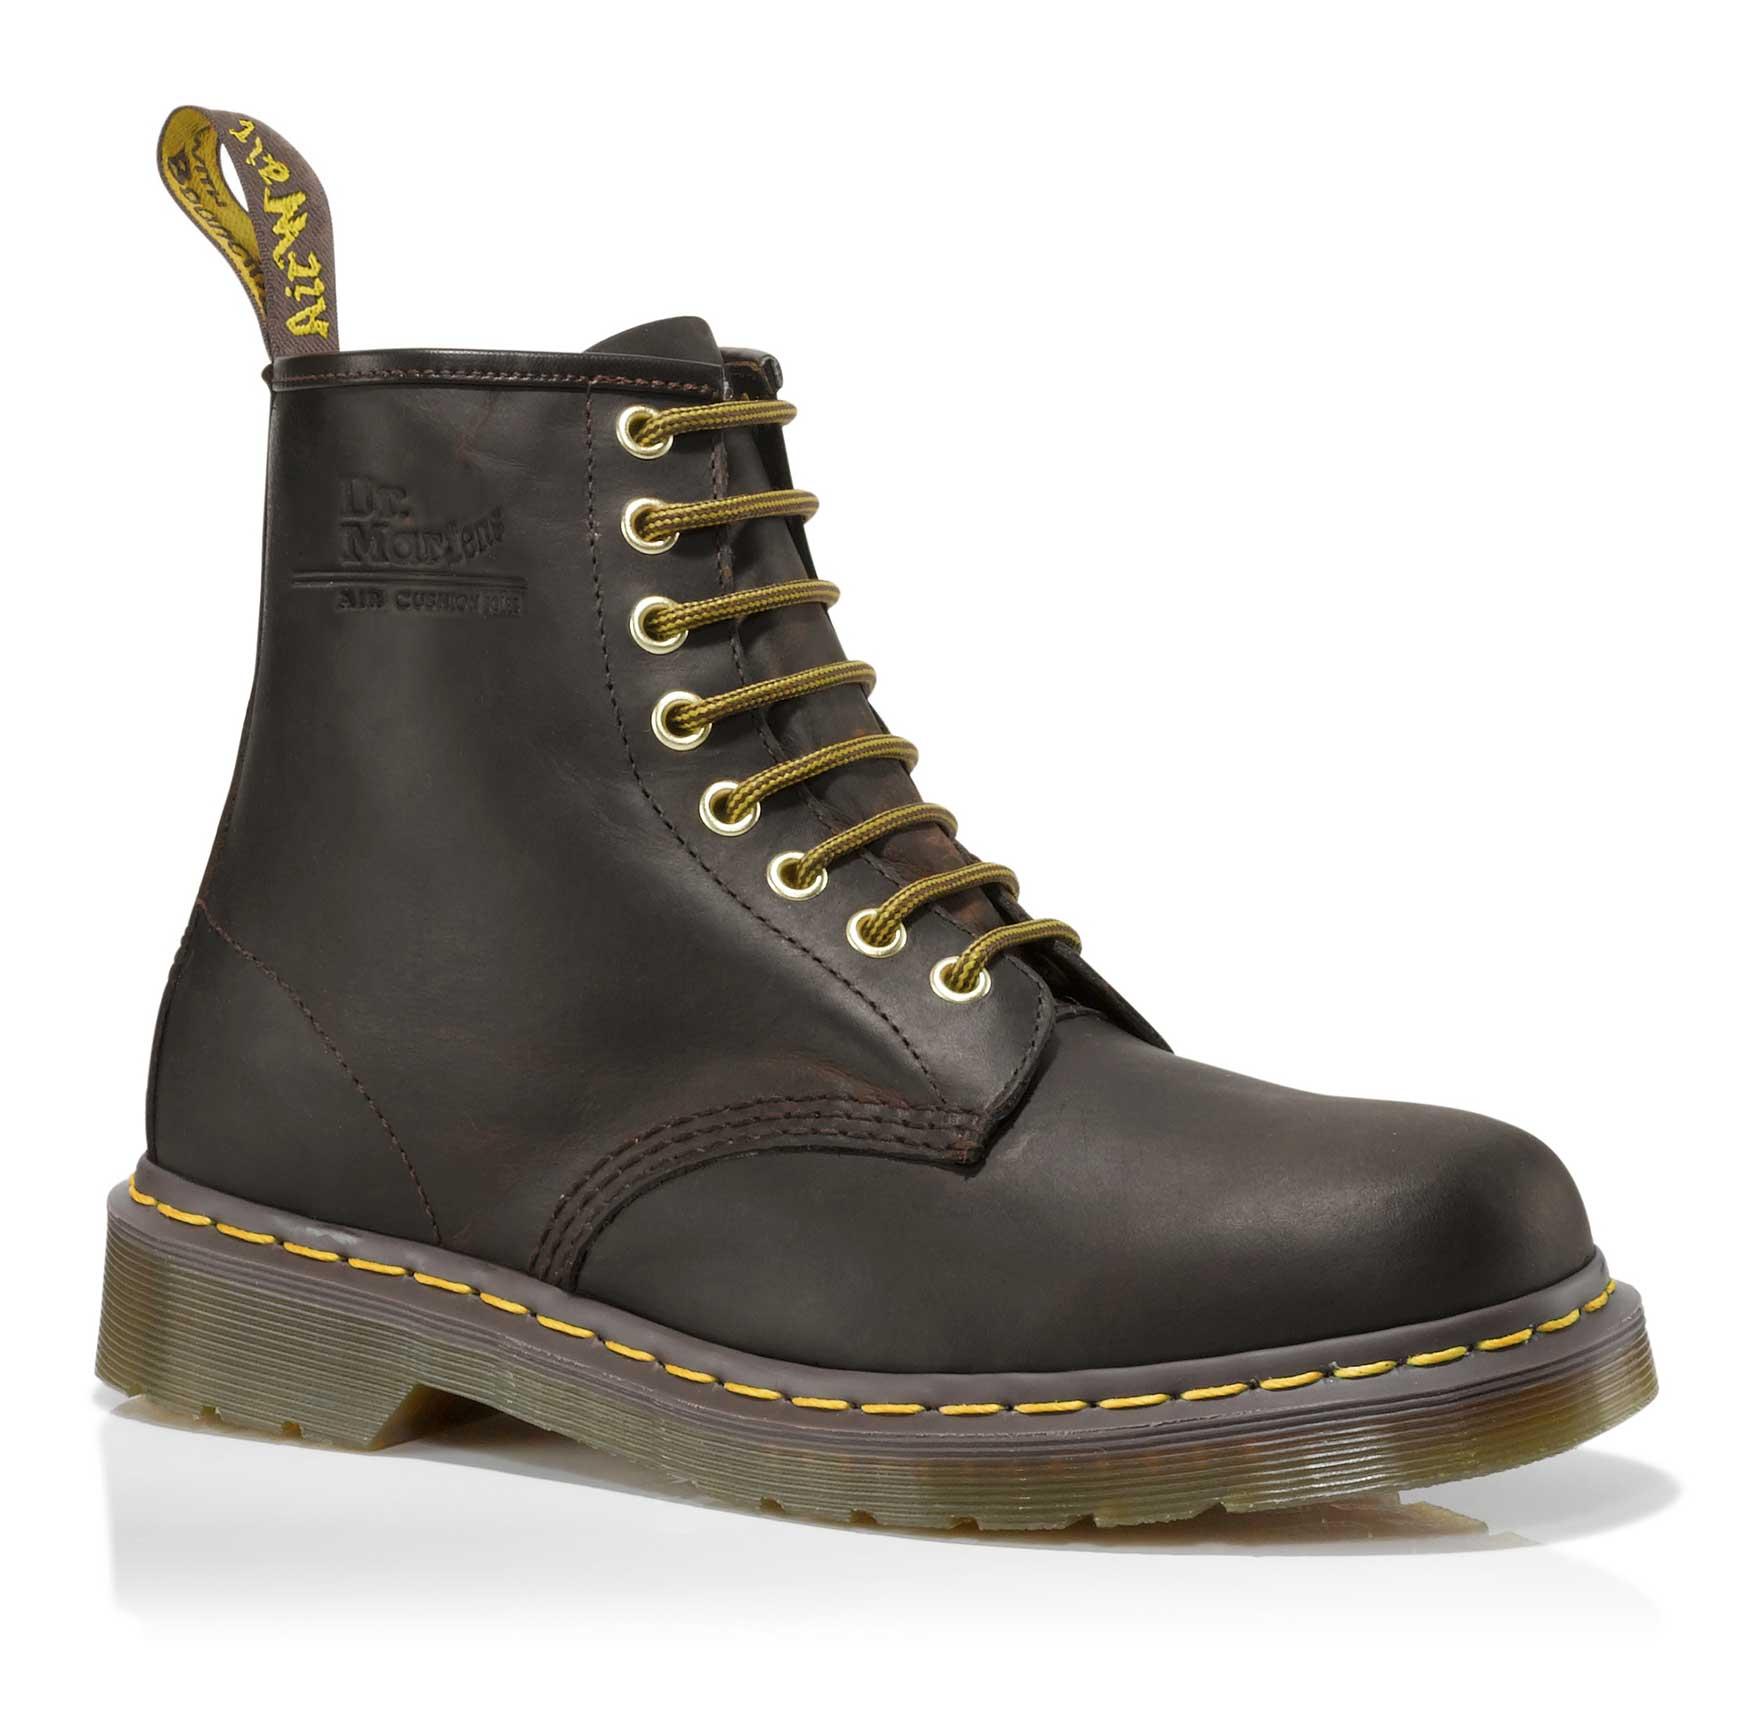 נעלי Dr. Martens יוניסקס - דגם 1460 8 Eye Boot